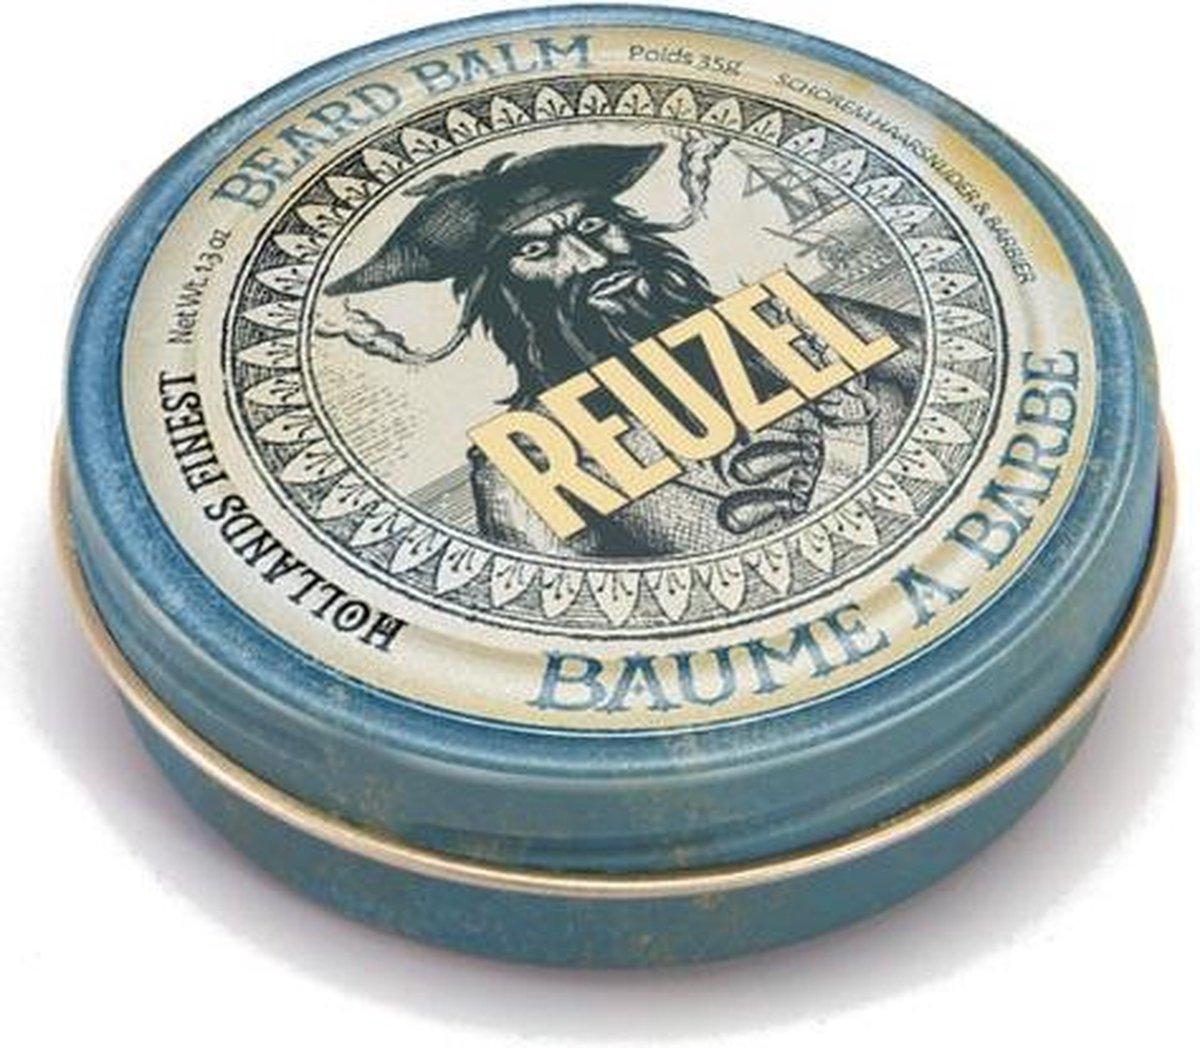 Reuzel - Beard Balm - 35 gr